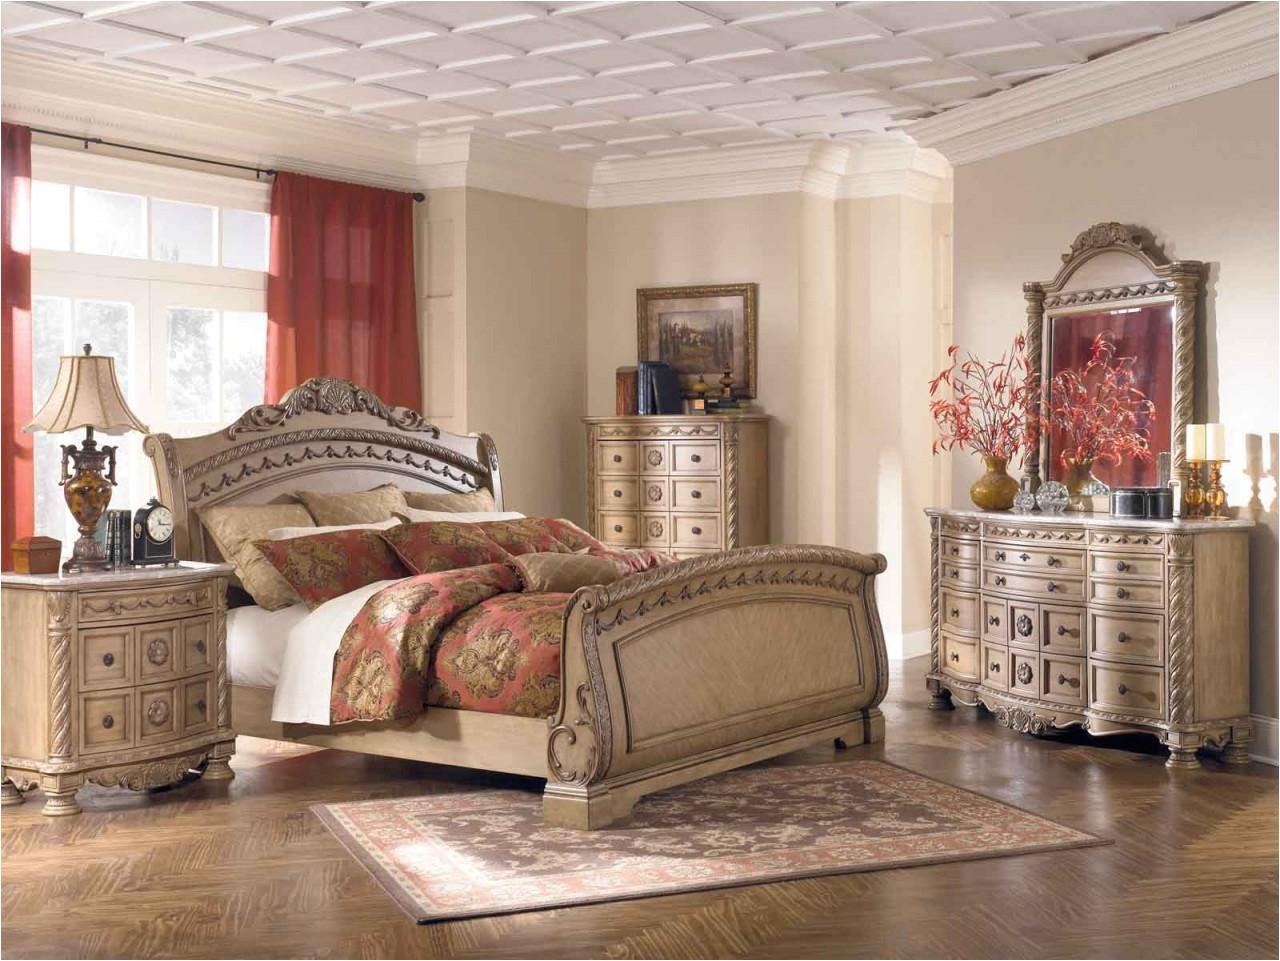 luxury home furniture bedroom sets 1 ashley beds for girls off white set